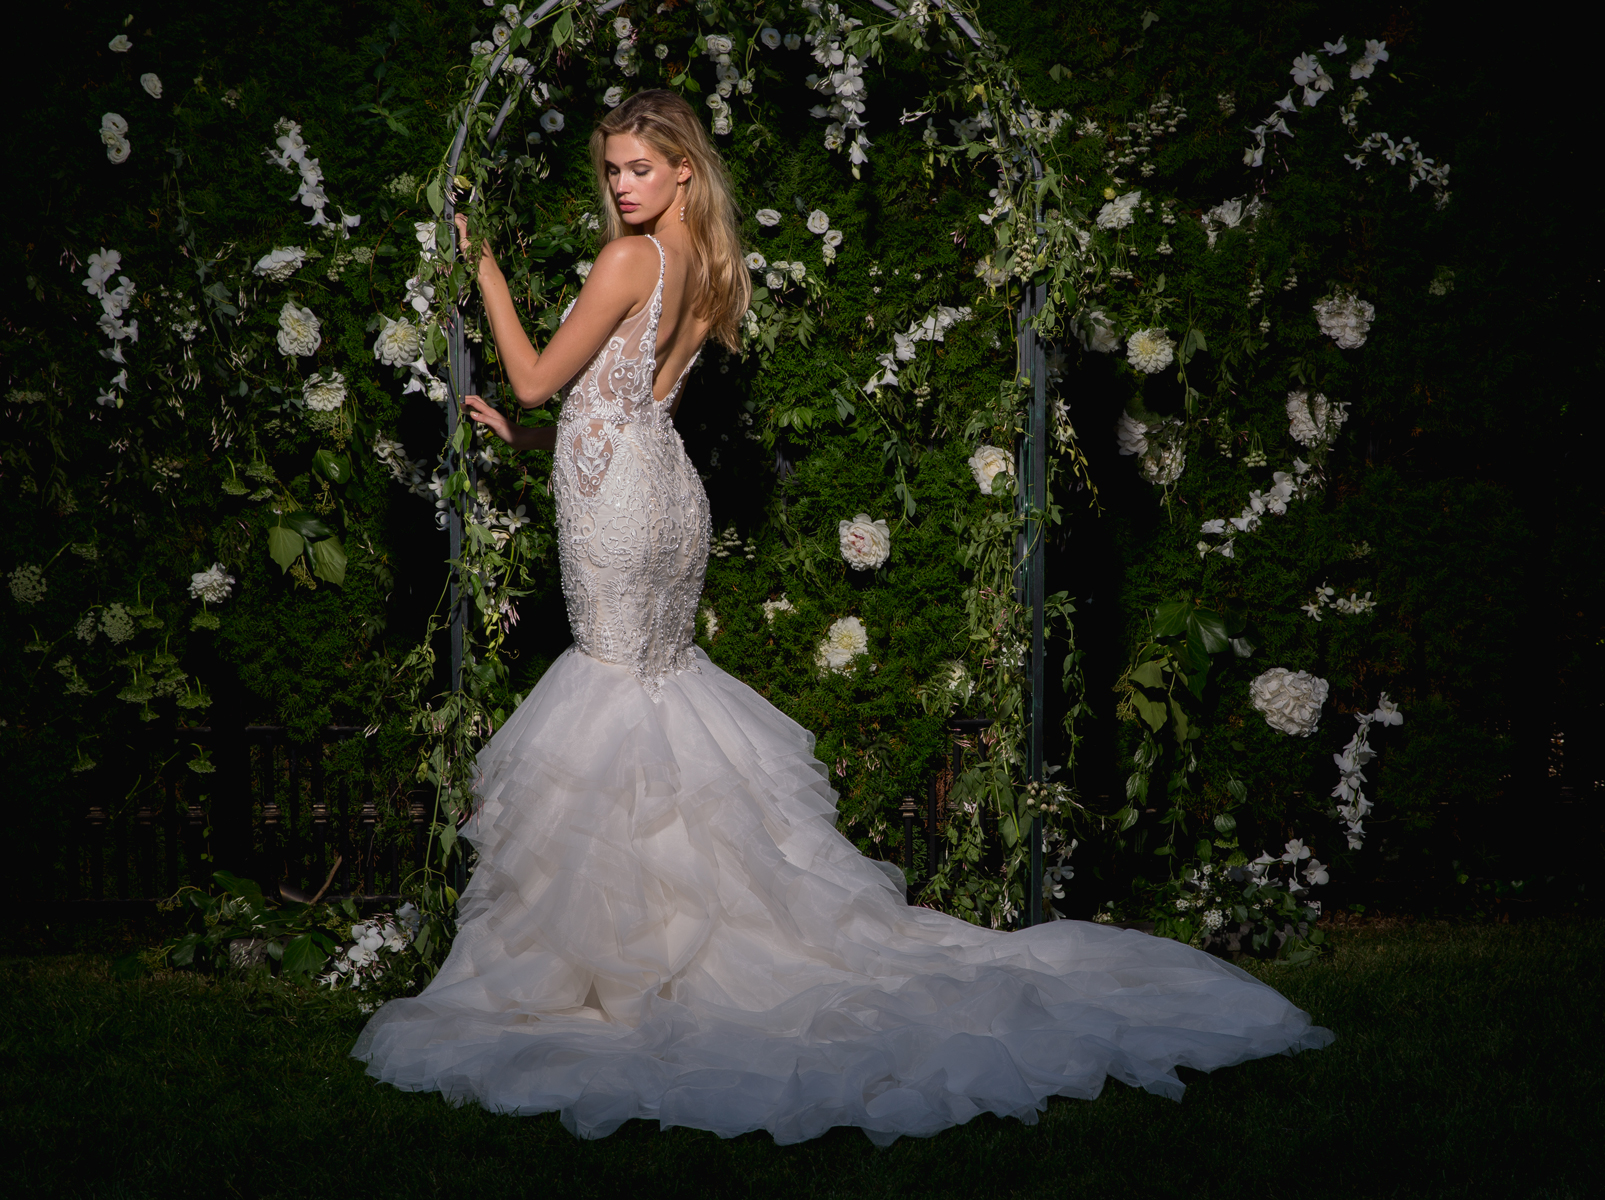 V-neck Sheer Beaded Bodice Fit And Flare Wedding Dress | Kleinfeld ...